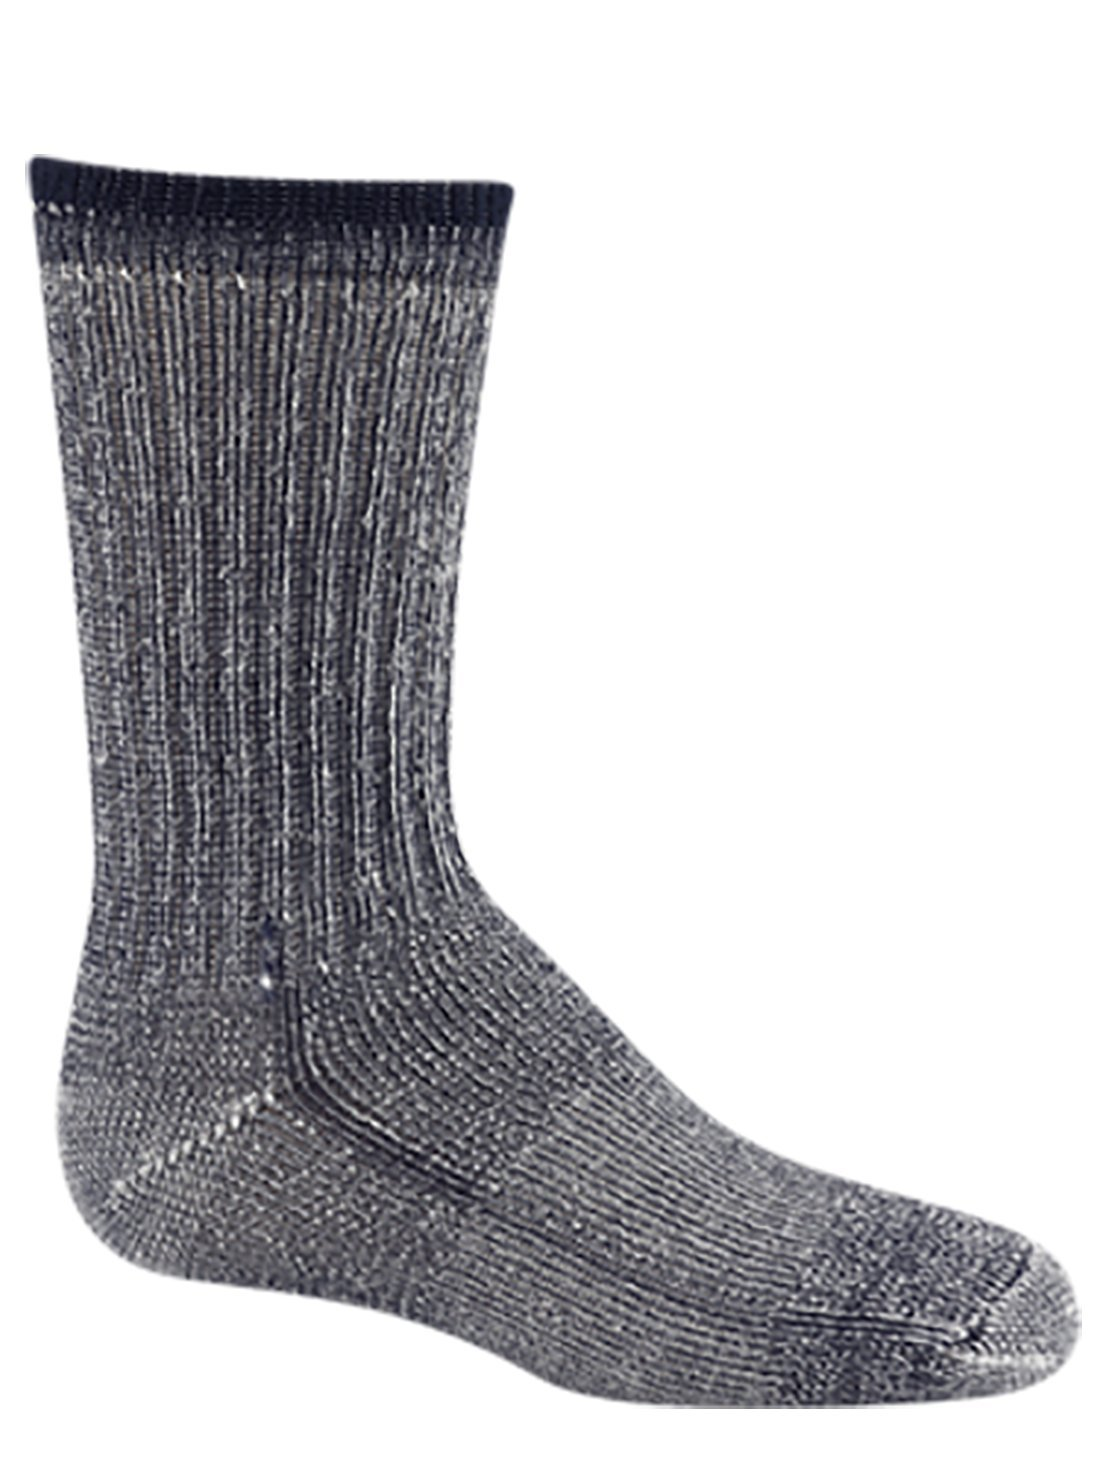 Wigwam Merino Wool Kid's Comfort Hiker Sock with a Helicase brand sock ring